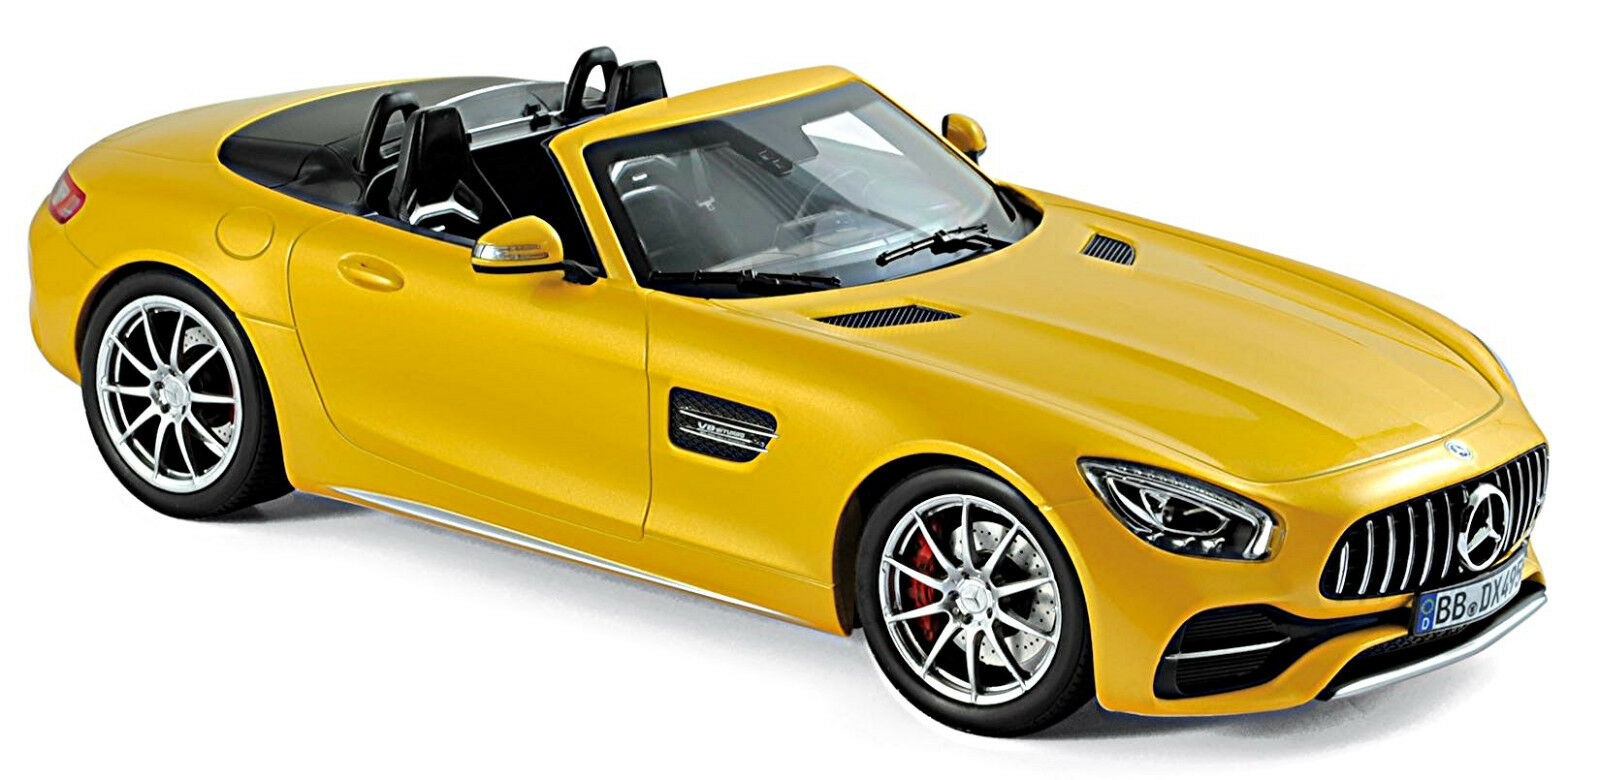 Mercedes-AMG GT C Roadster 2017 Jaune jaune Metallic 1 18 Norev